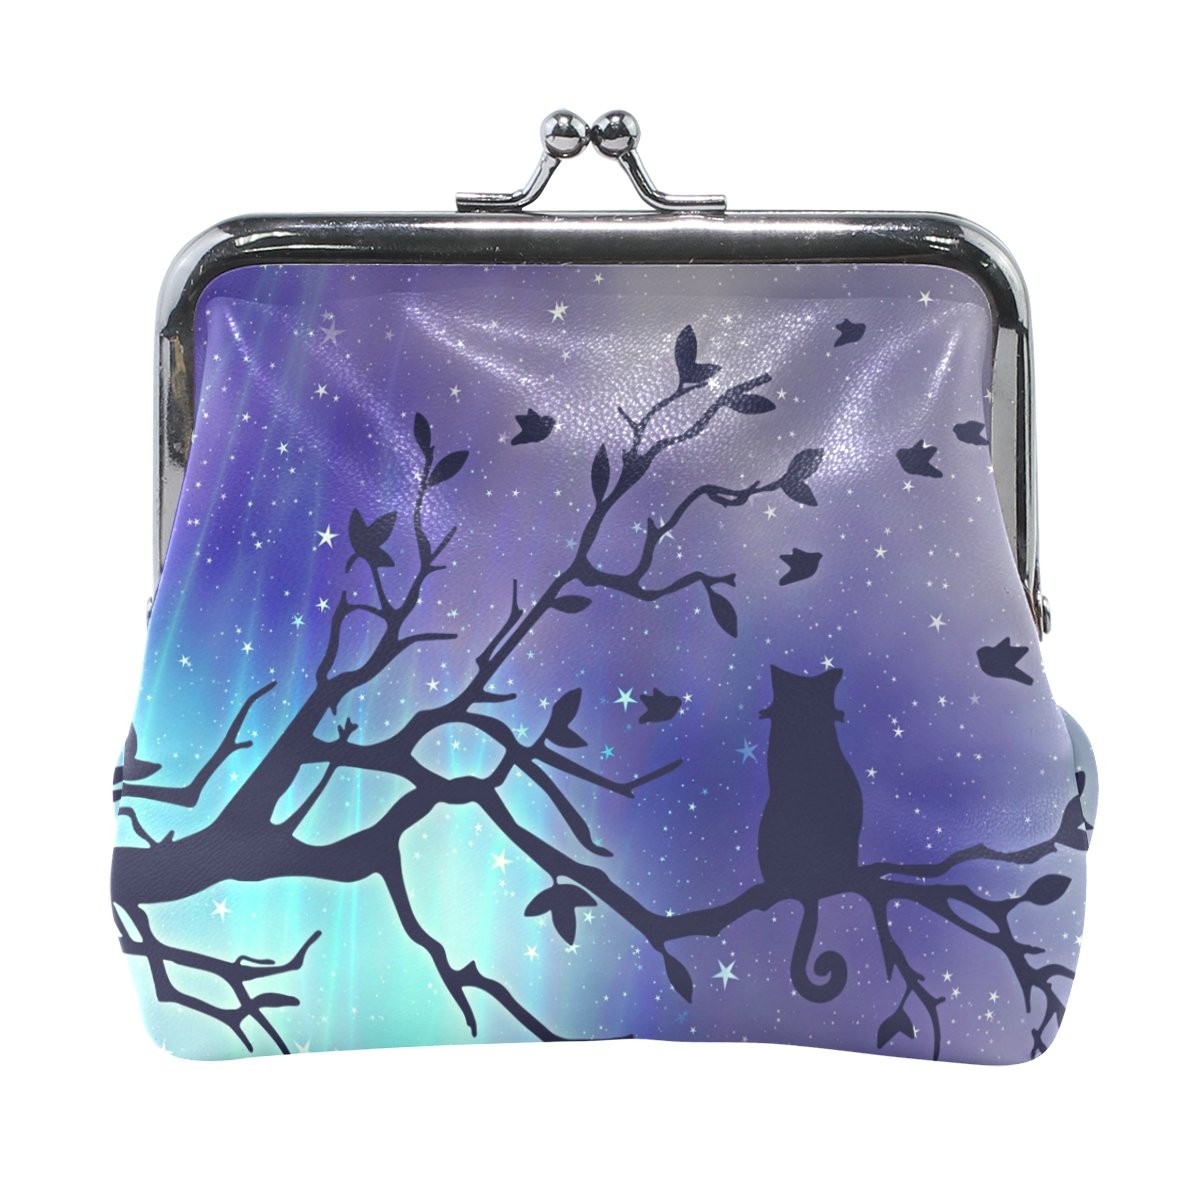 Coin Purse Cat Tree Night Sky Wallet Buckle Clutch Handbag For Women Girls Gift